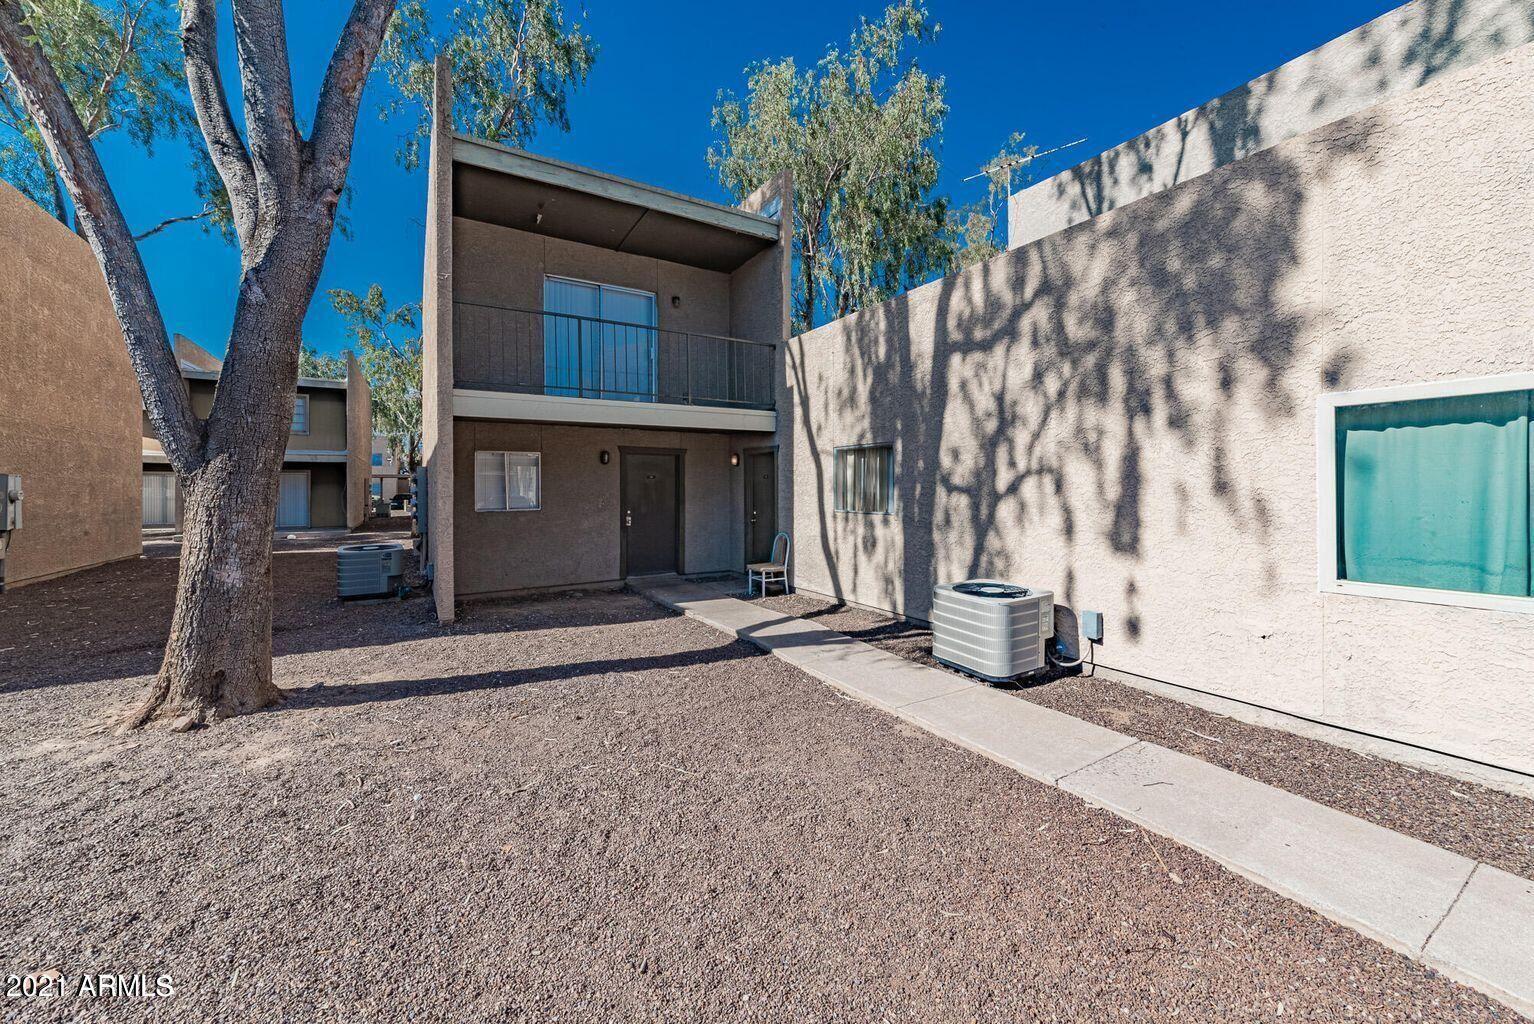 2838 E MONTE CRISTO Avenue, Phoenix, AZ 85032 - MLS#: 6272247